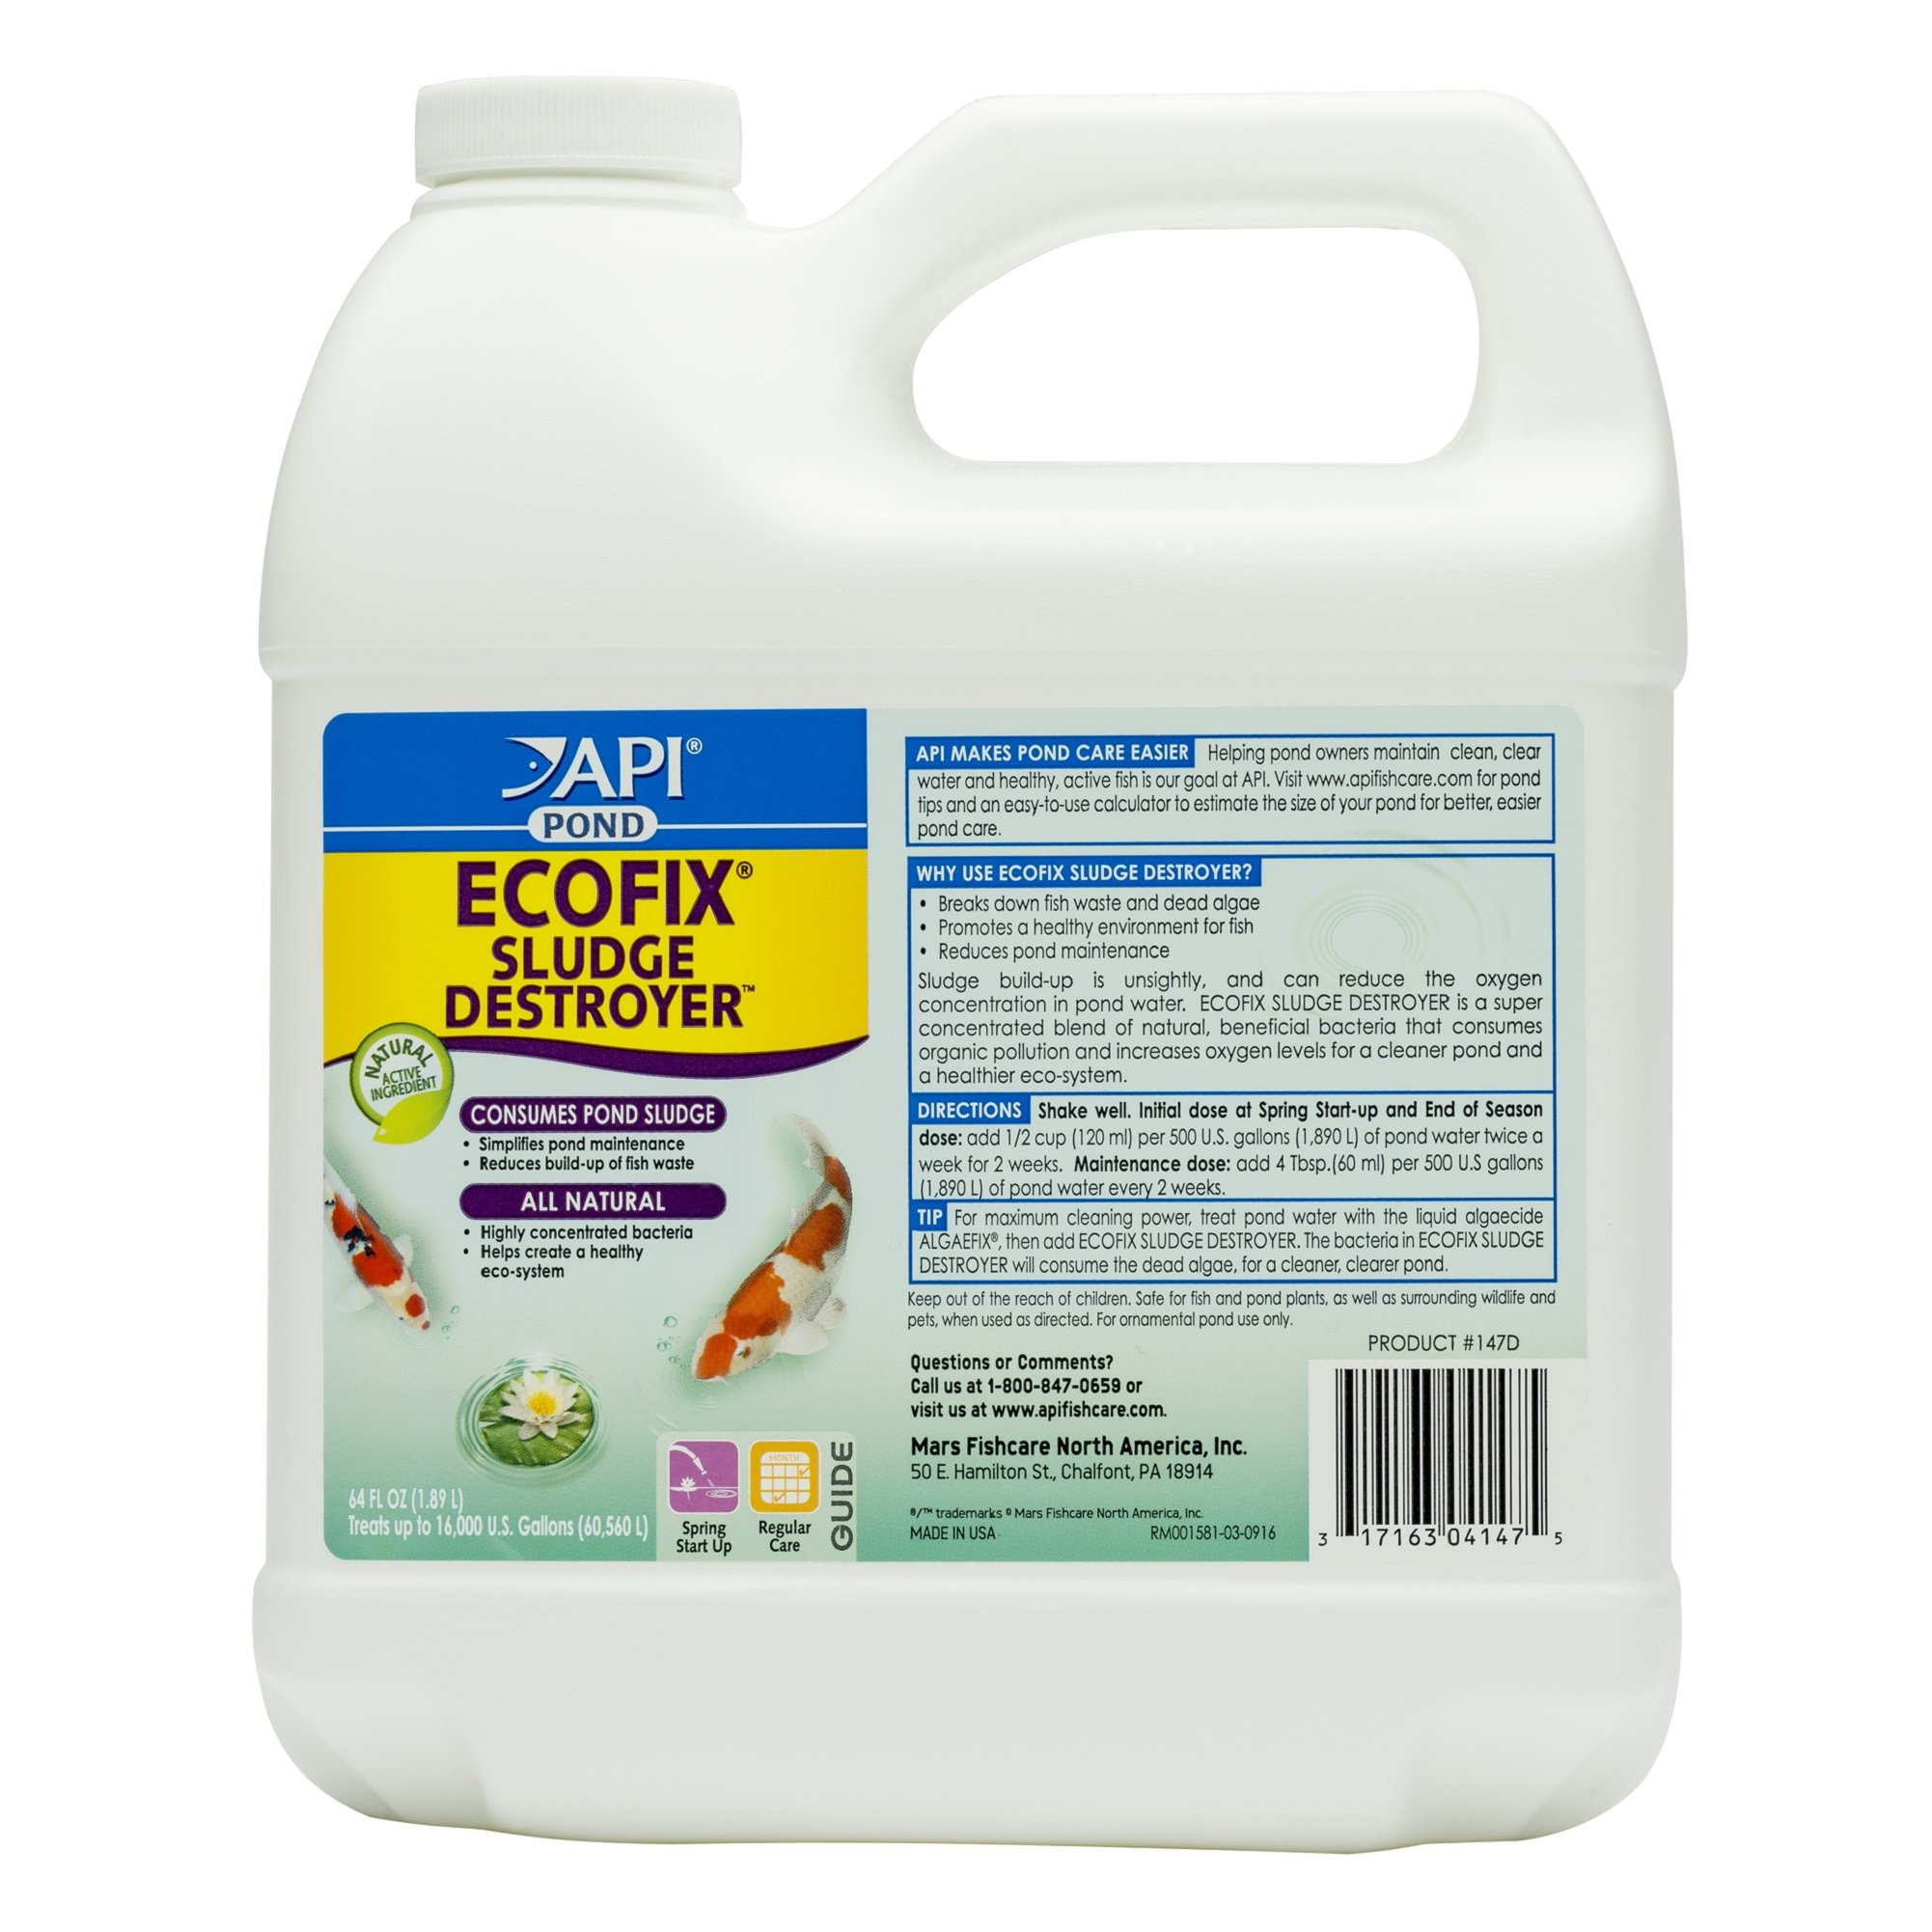 API POND ECOFIX SLUDGE DESTROYER Pond Water Clarifier and Sludge Remover Treatment 64-Ounce Bottle by API (Image #1)